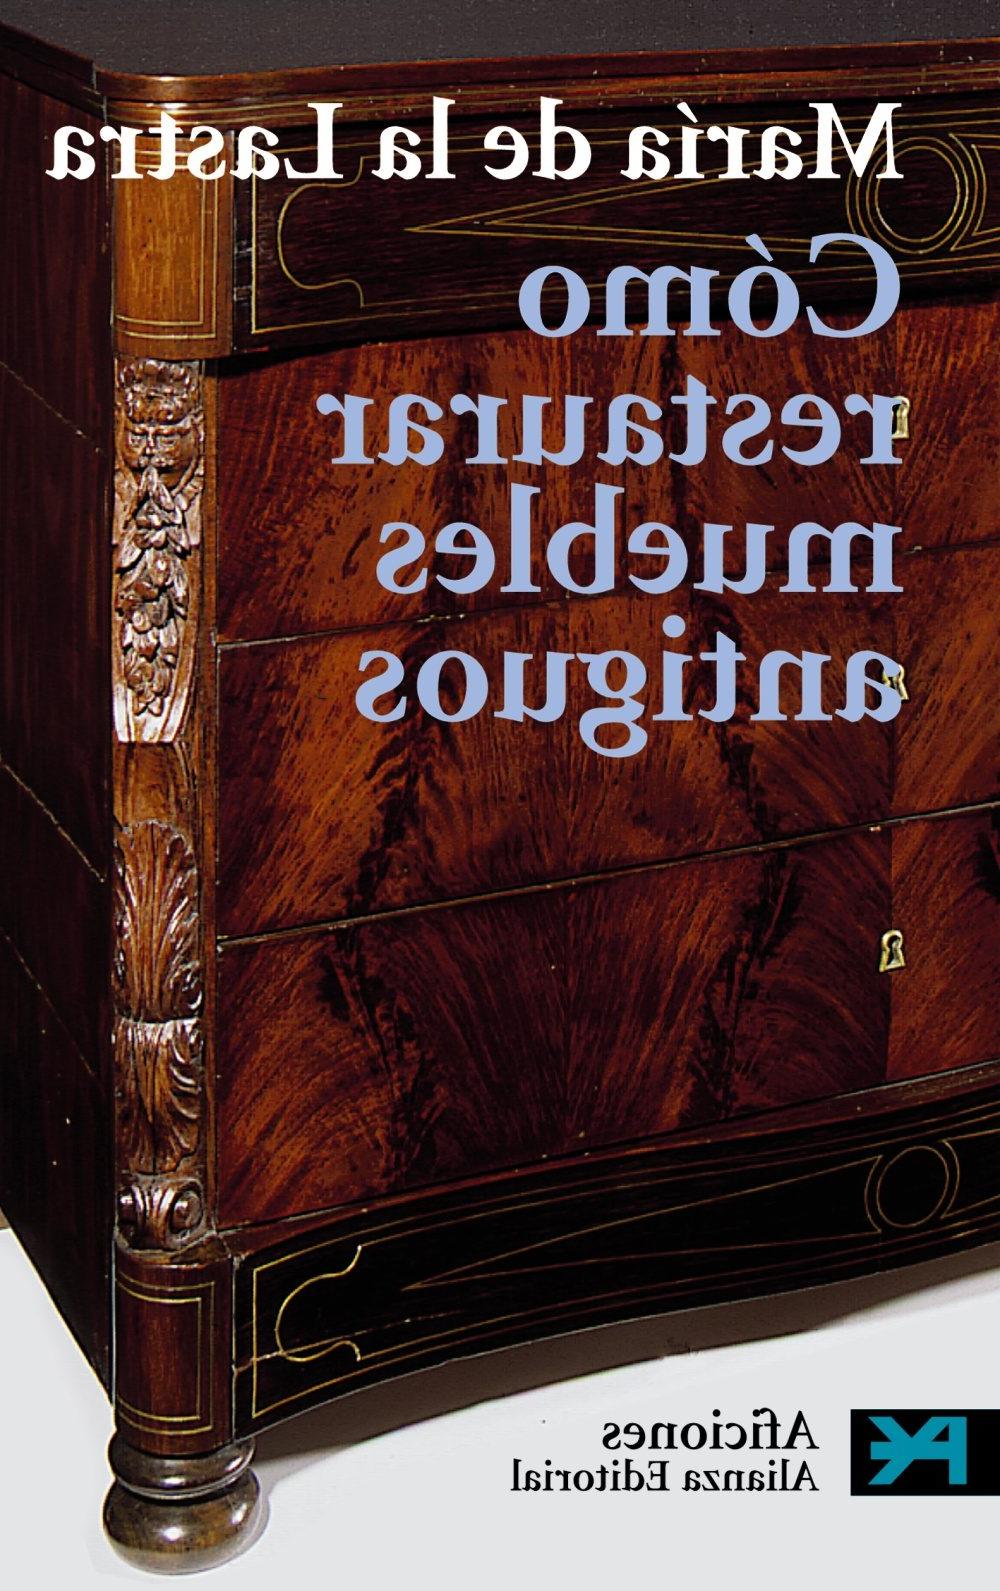 Venta De Muebles Antiguos Para Restaurar X8d1 O Restaurar Muebles Antiguos Manual Basico Para Principiantes